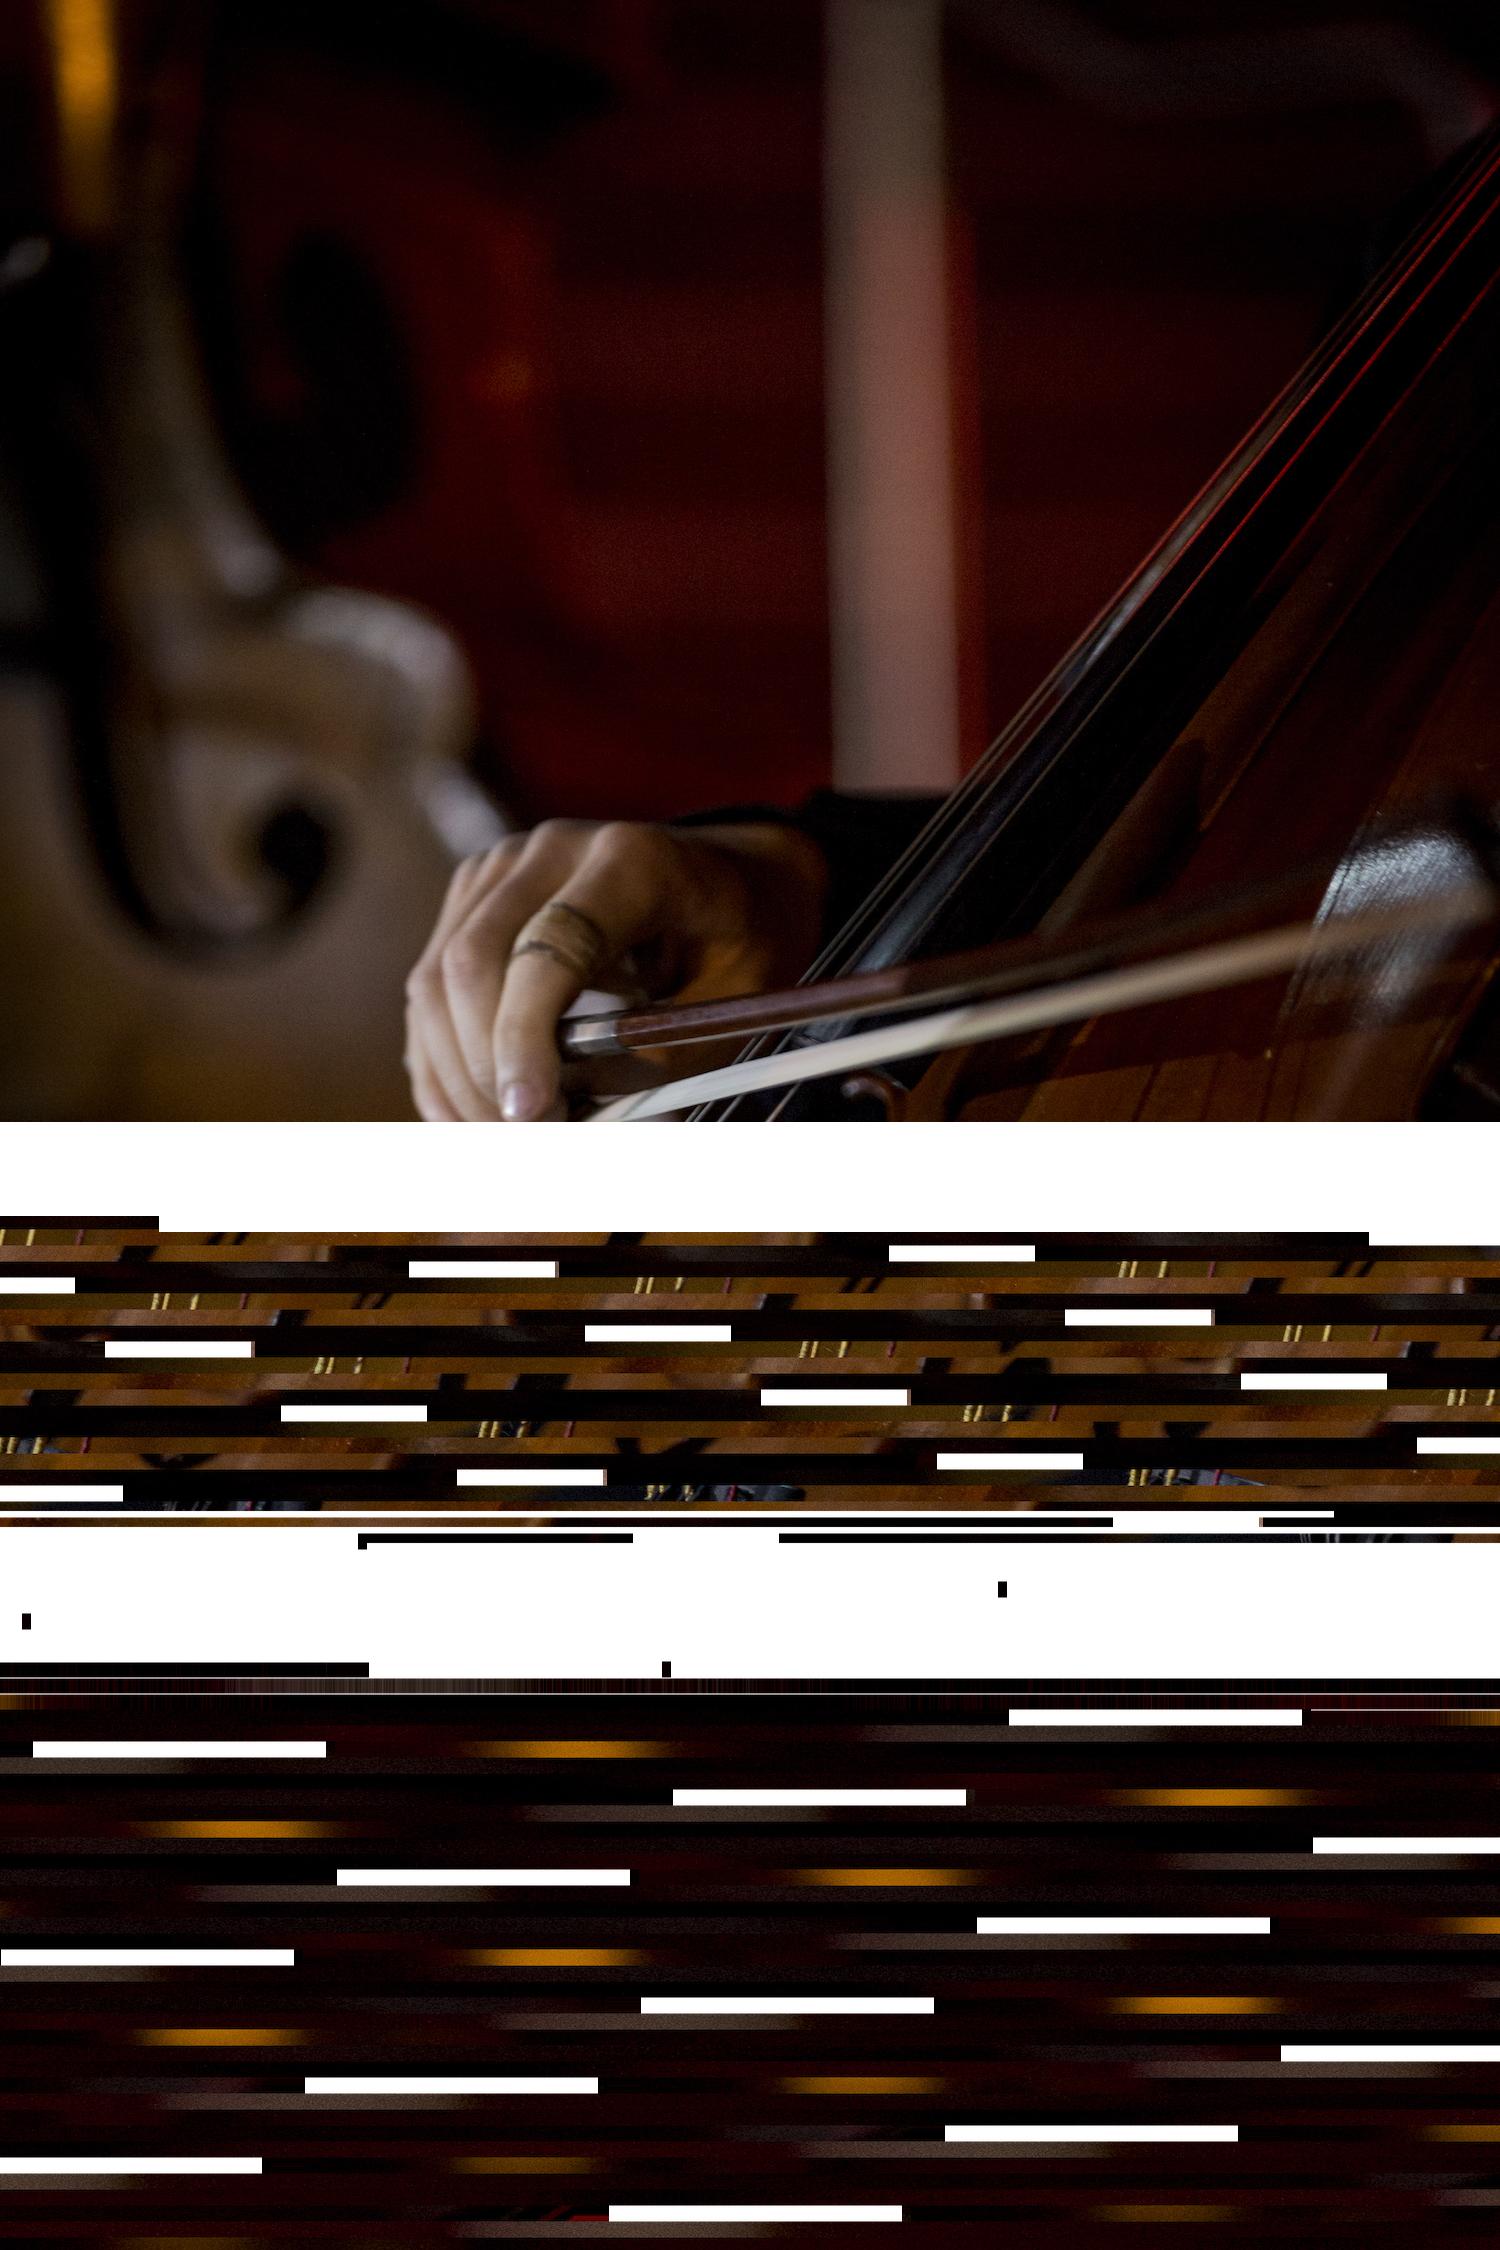 Artist: Geelong Symphony Orchestra; Photographer: Matt Houston